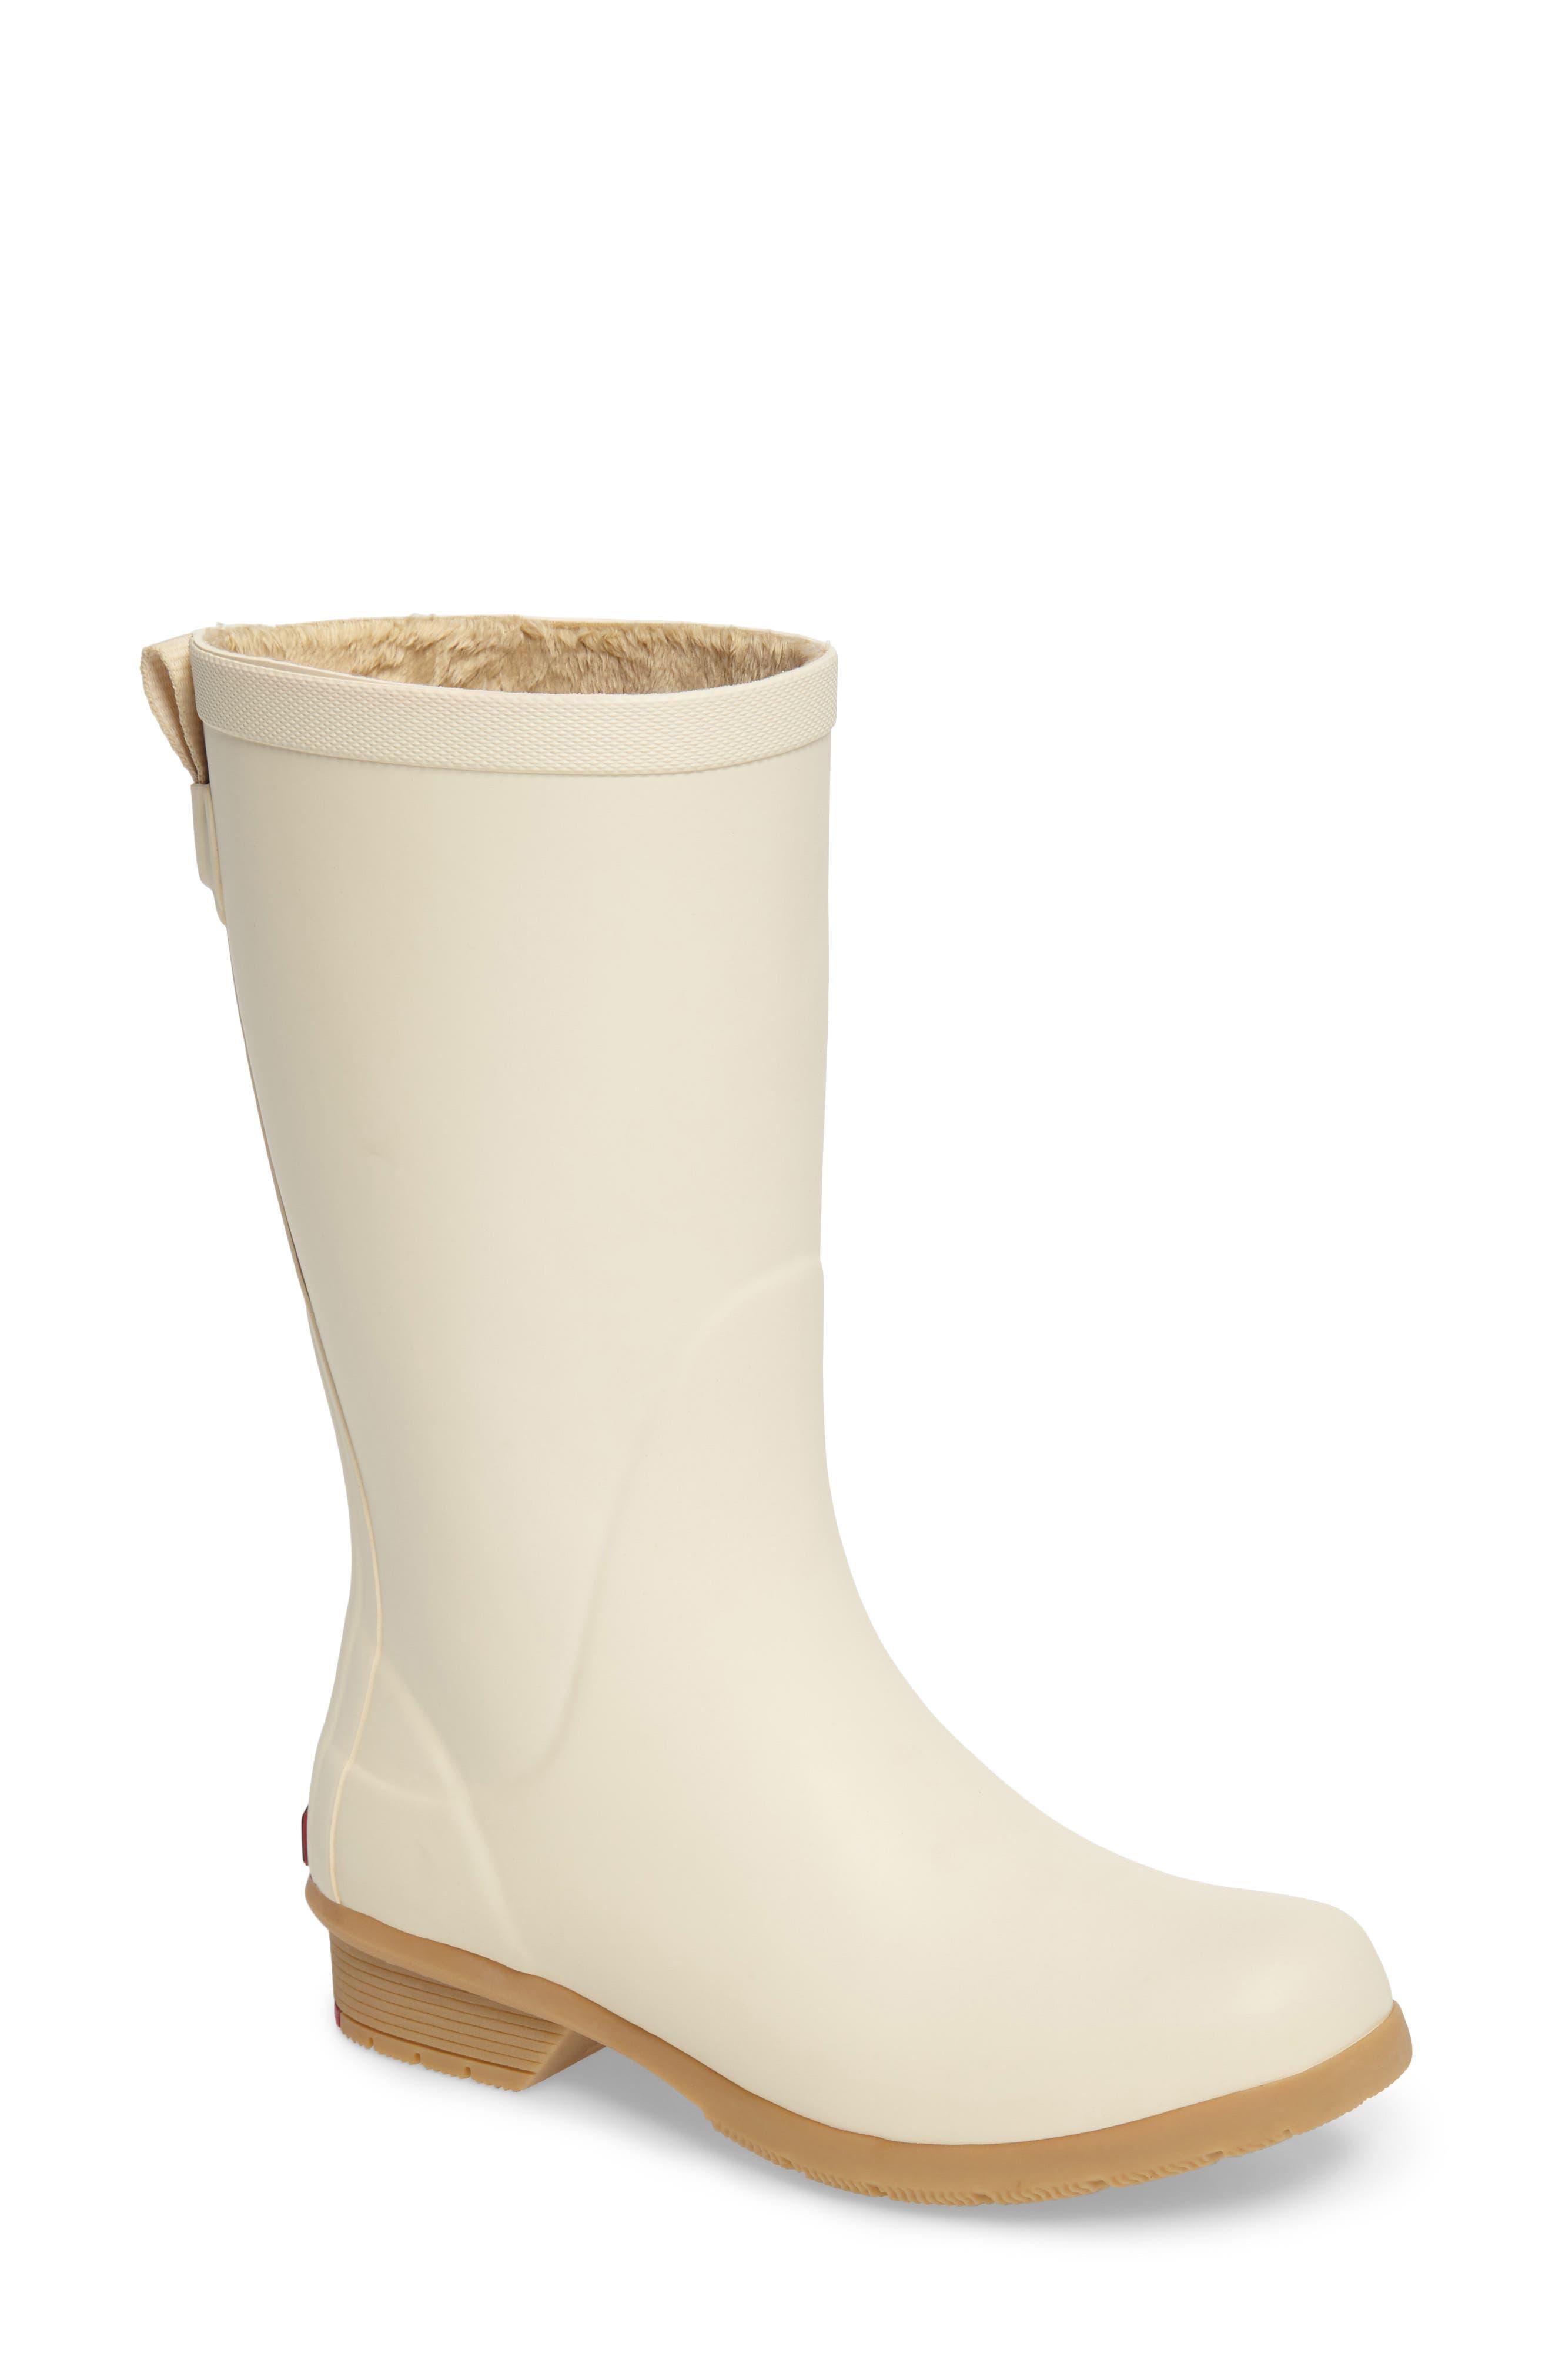 Alternate Image 1 Selected - Chooka Bainbridge Rain Boot (Women)